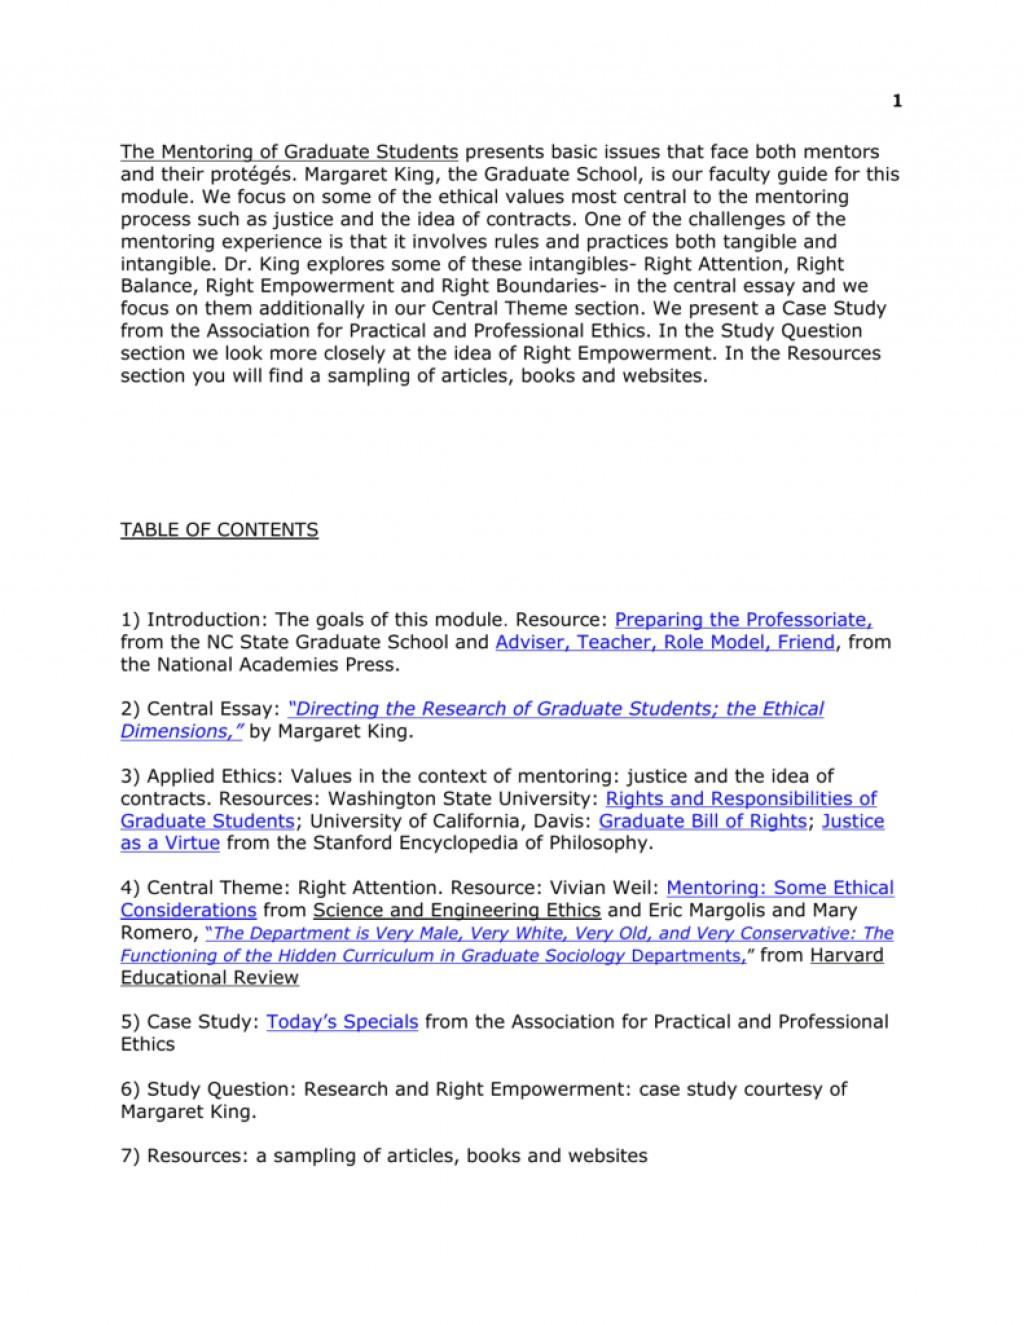 014 Essay Example 005868305 1 Shocking Mentorship Mentoring Contoh Large